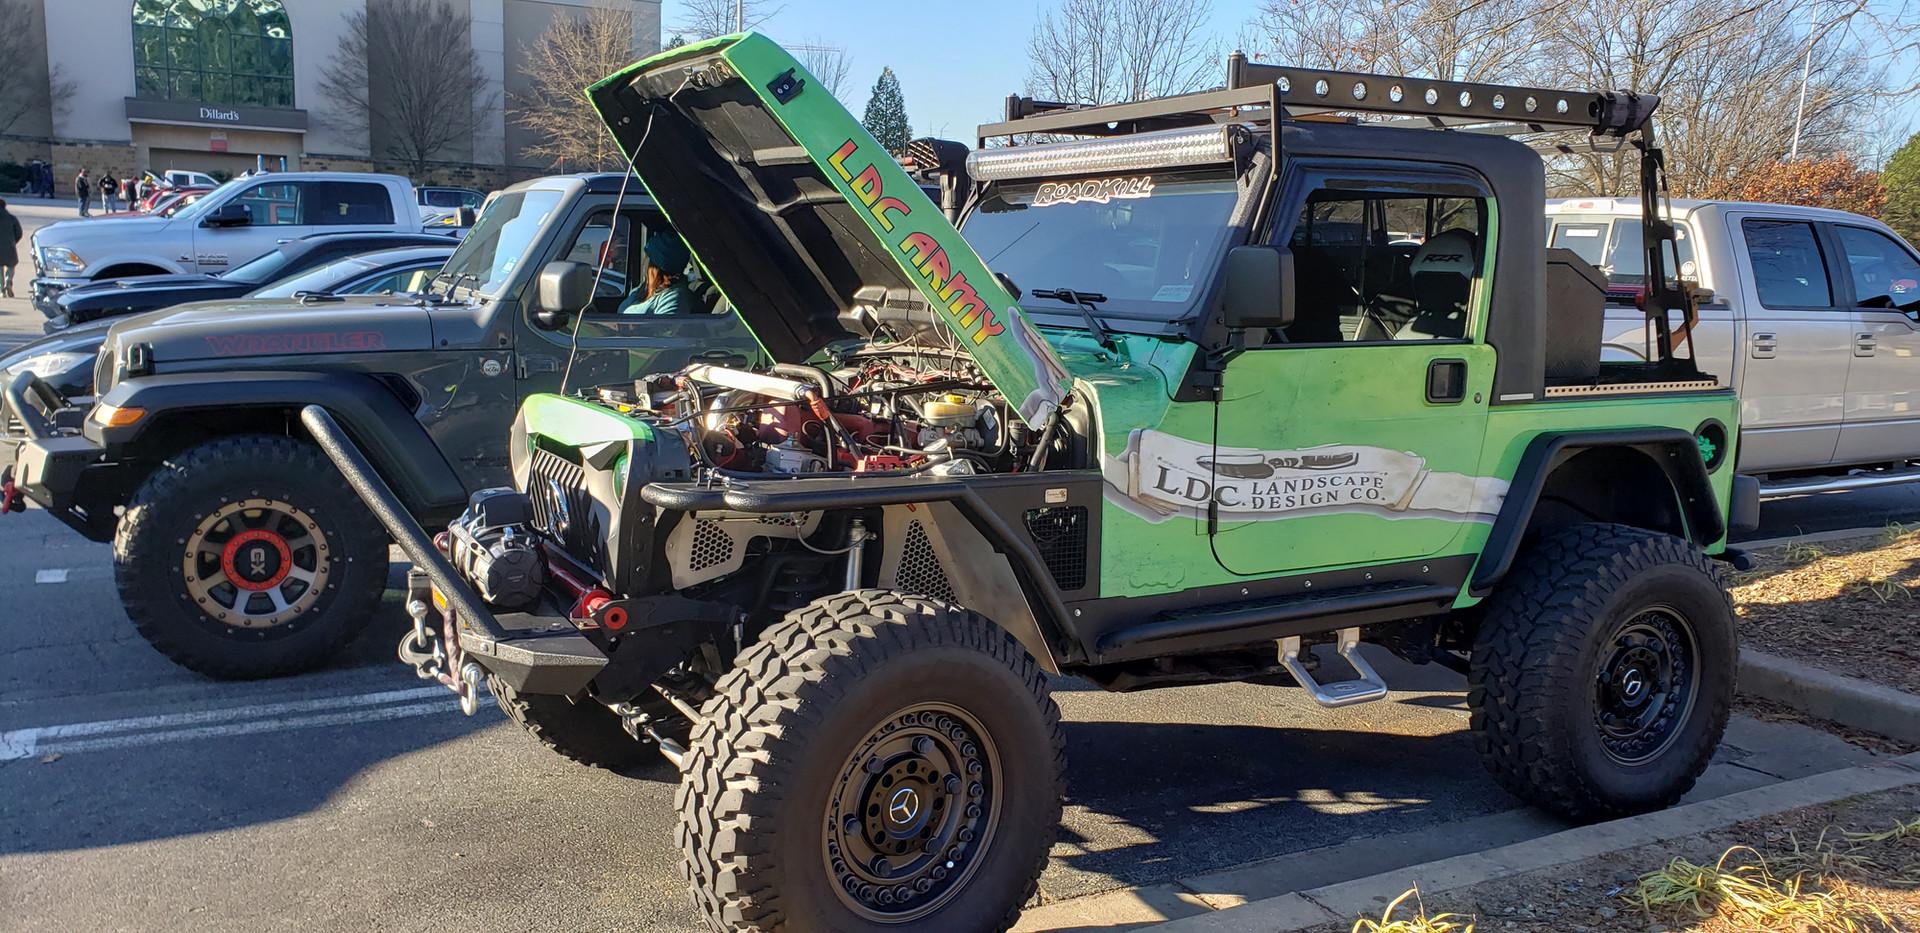 97 Turbo Diesel JeeBenz